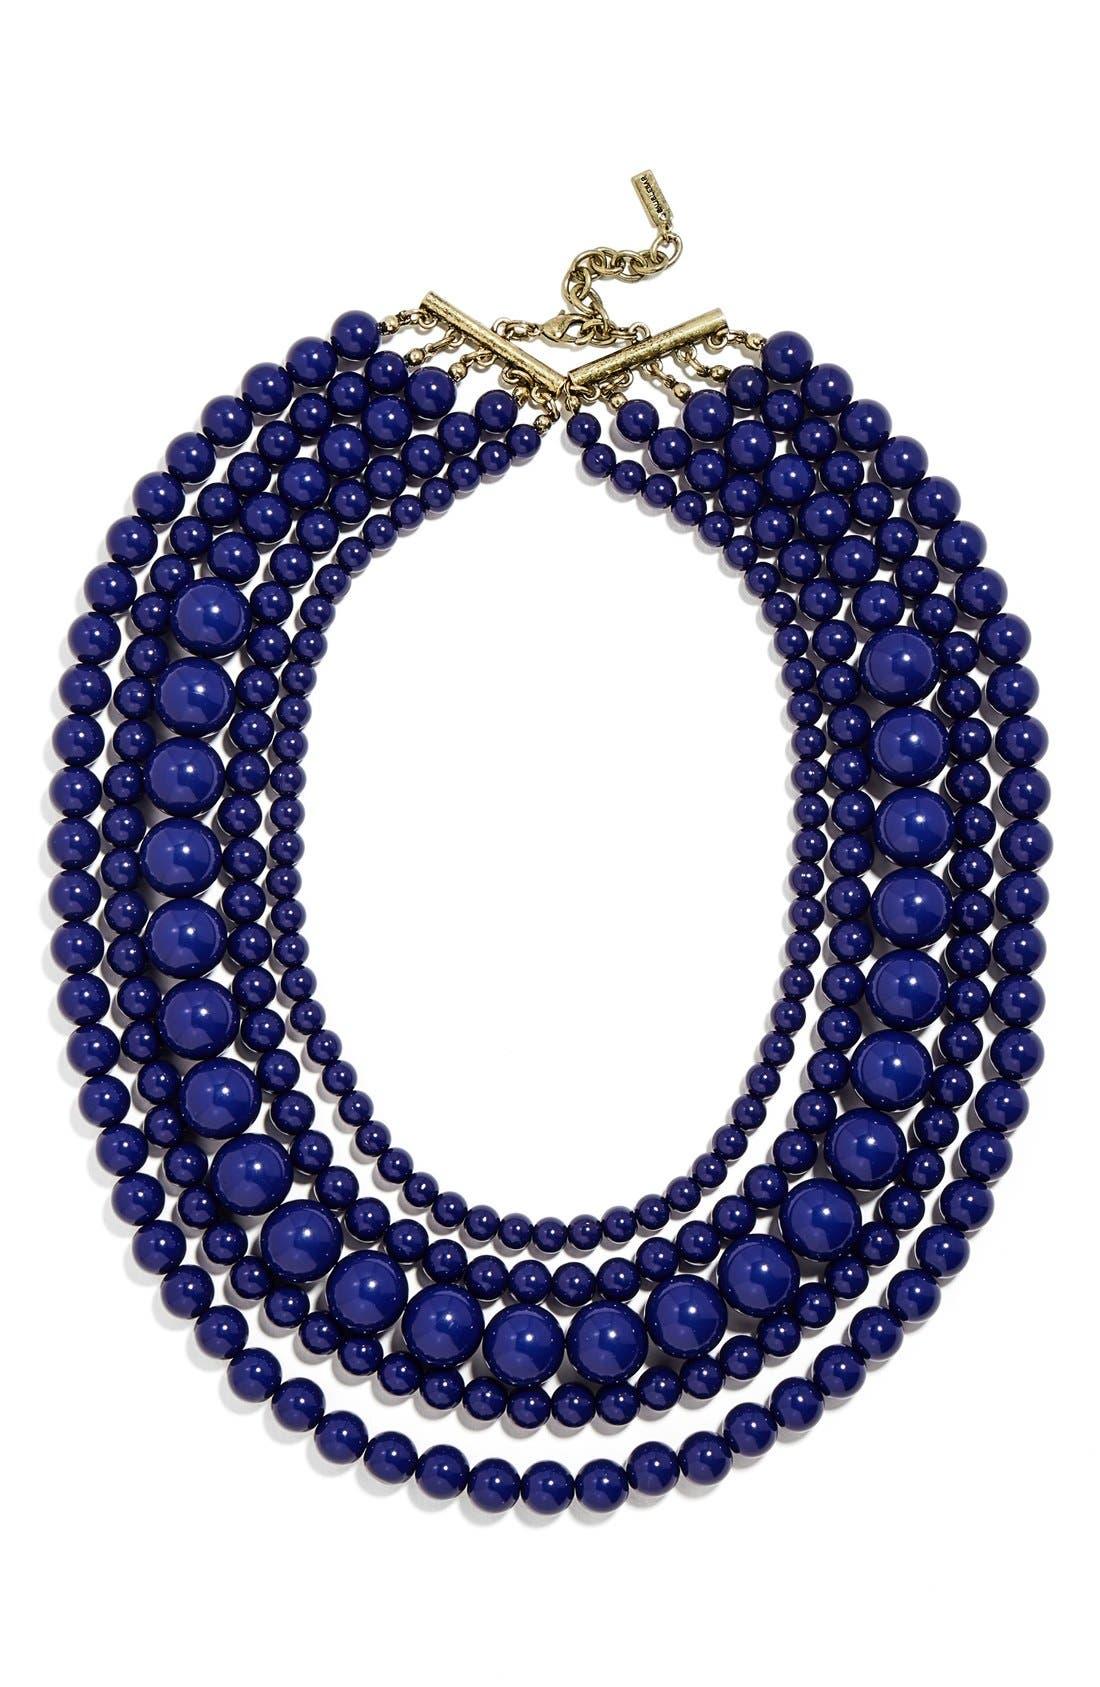 Alternate Image 1 Selected - BaubleBar 'Globe' Multistrand Beaded Necklace